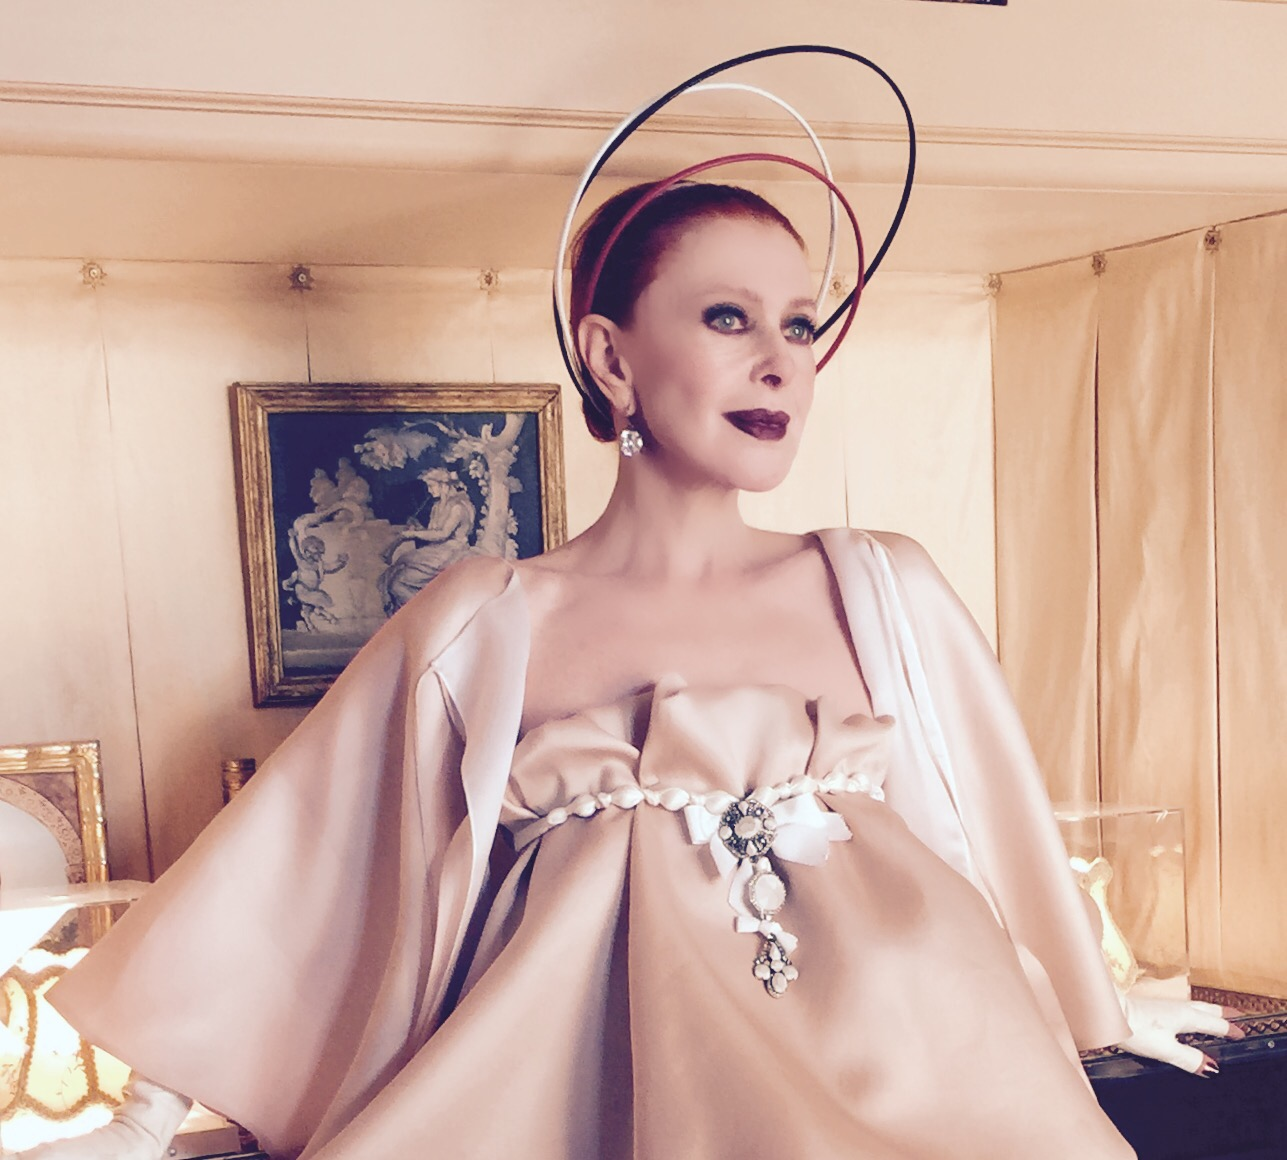 Valerie von Sobel, Advanced Style, cause and yvette